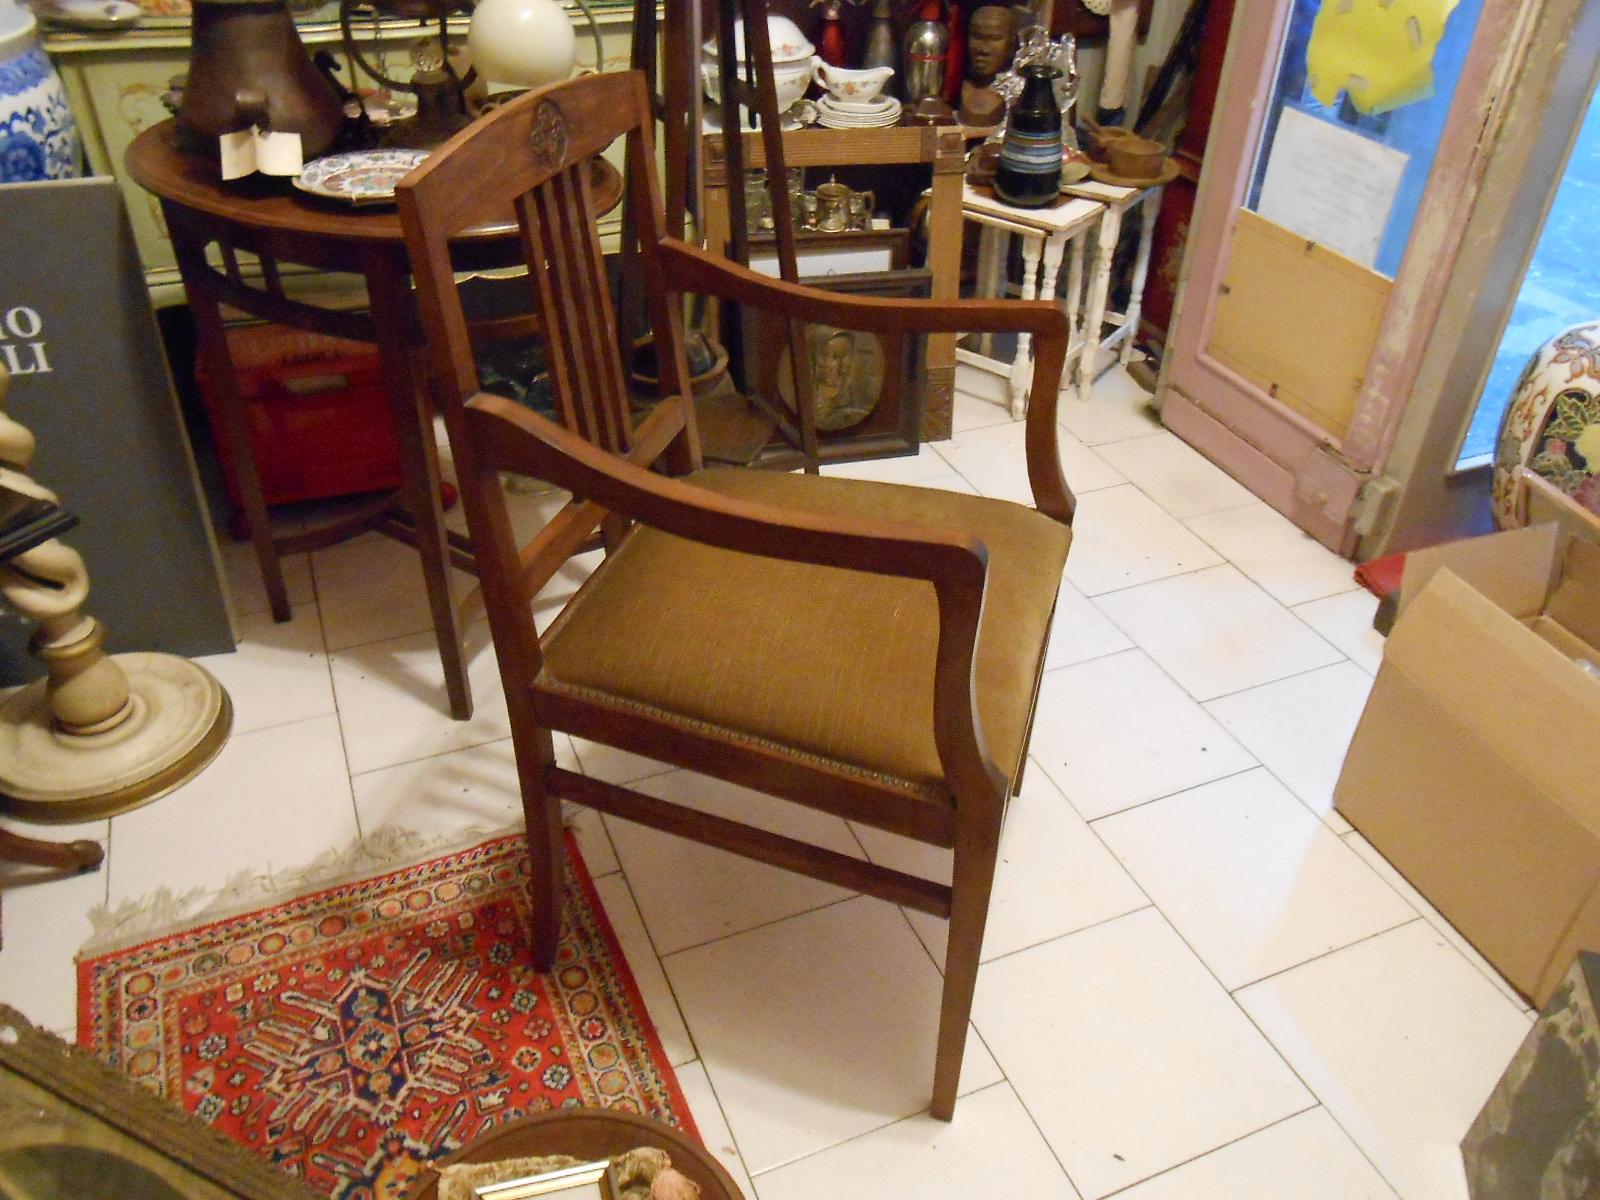 Antico e grande cadregun poltrona sedia trono liberty - Sostituire seduta sedia ...